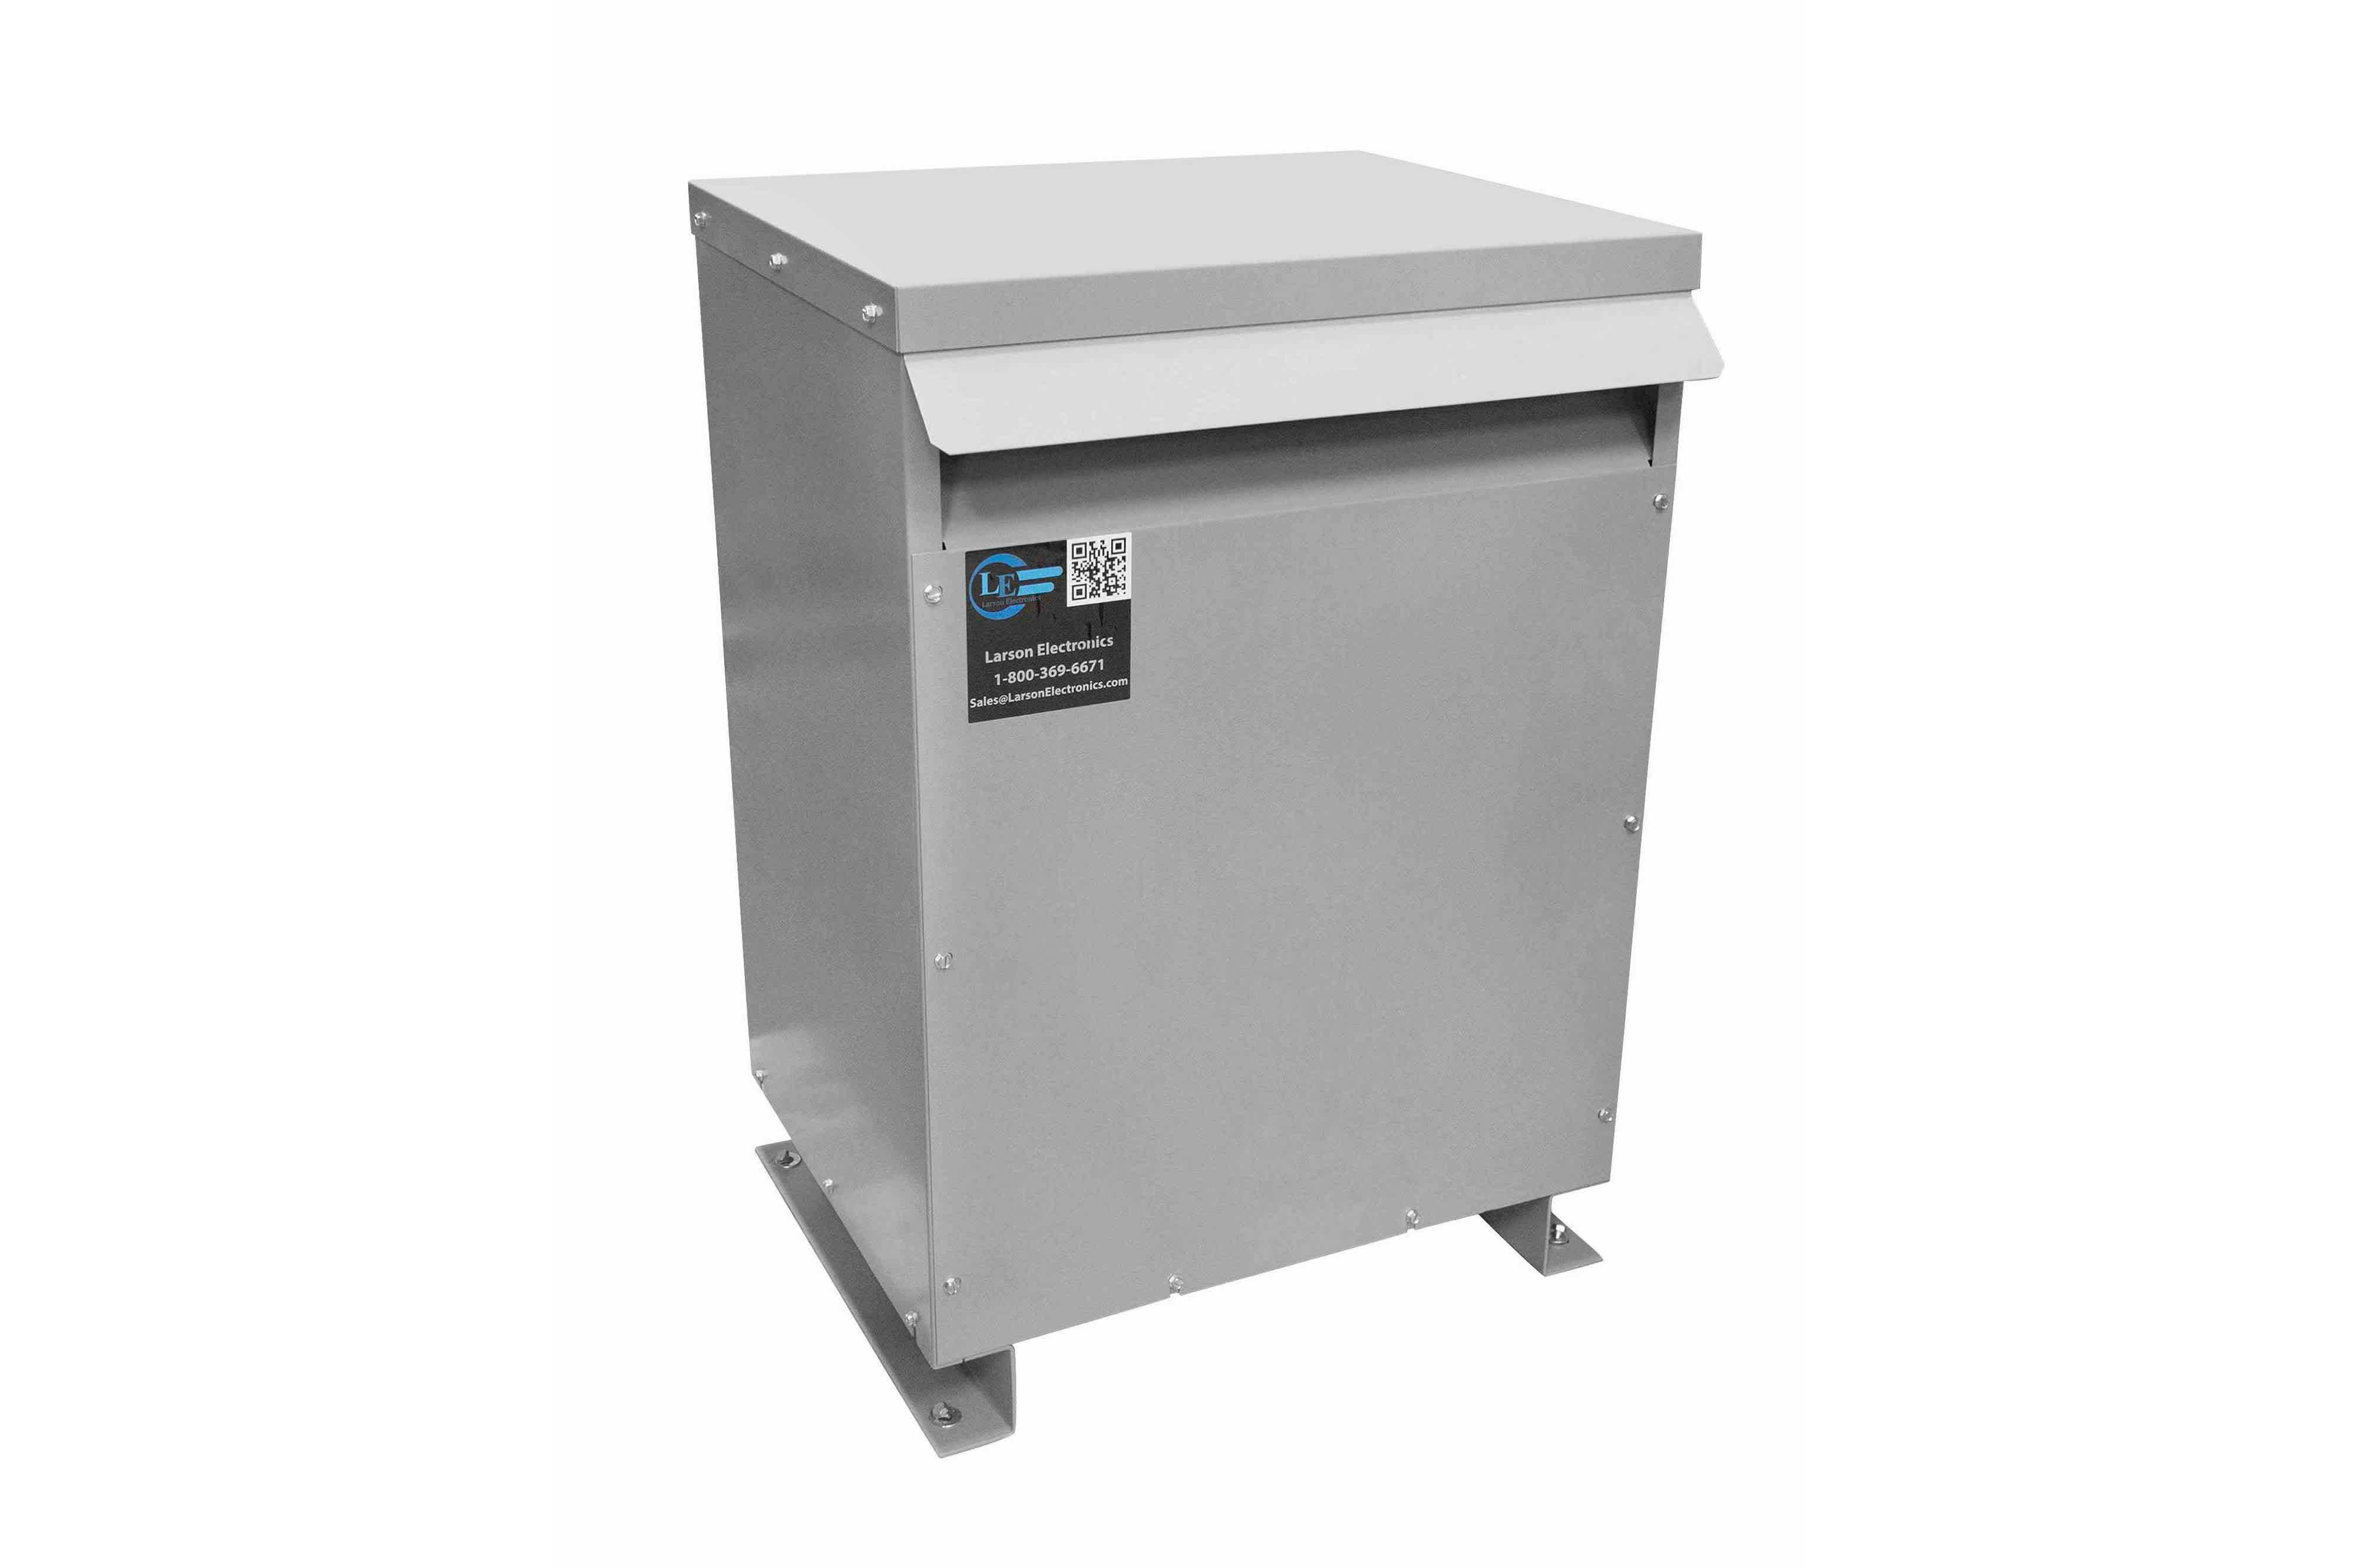 70 kVA 3PH Isolation Transformer, 415V Wye Primary, 480V Delta Secondary, N3R, Ventilated, 60 Hz